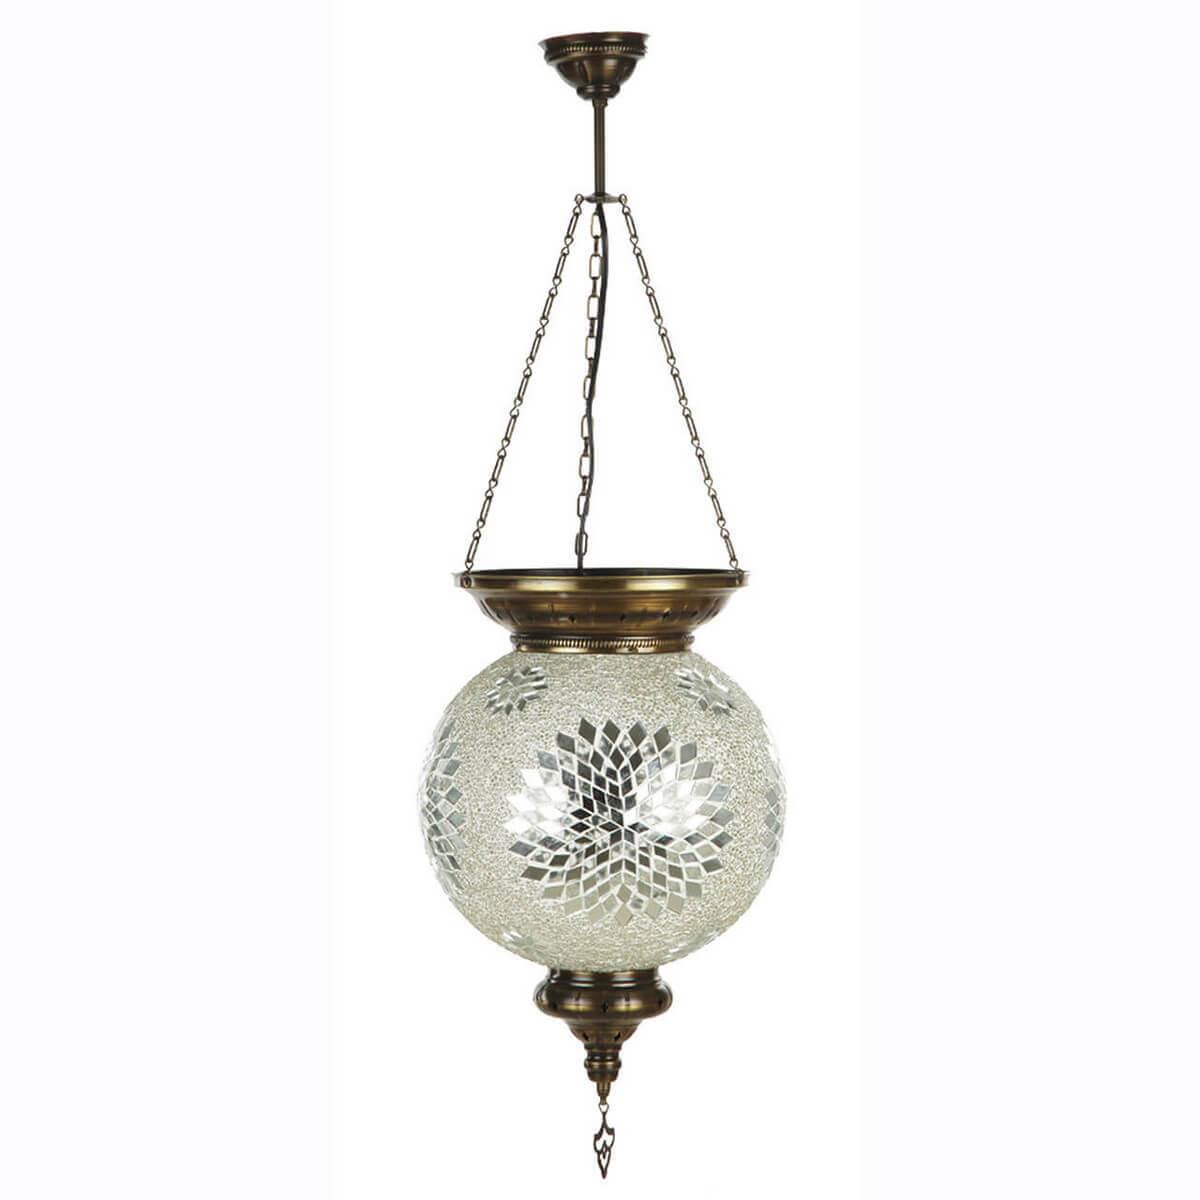 цена на Светильник Kink Light 0130T,01 Марокко